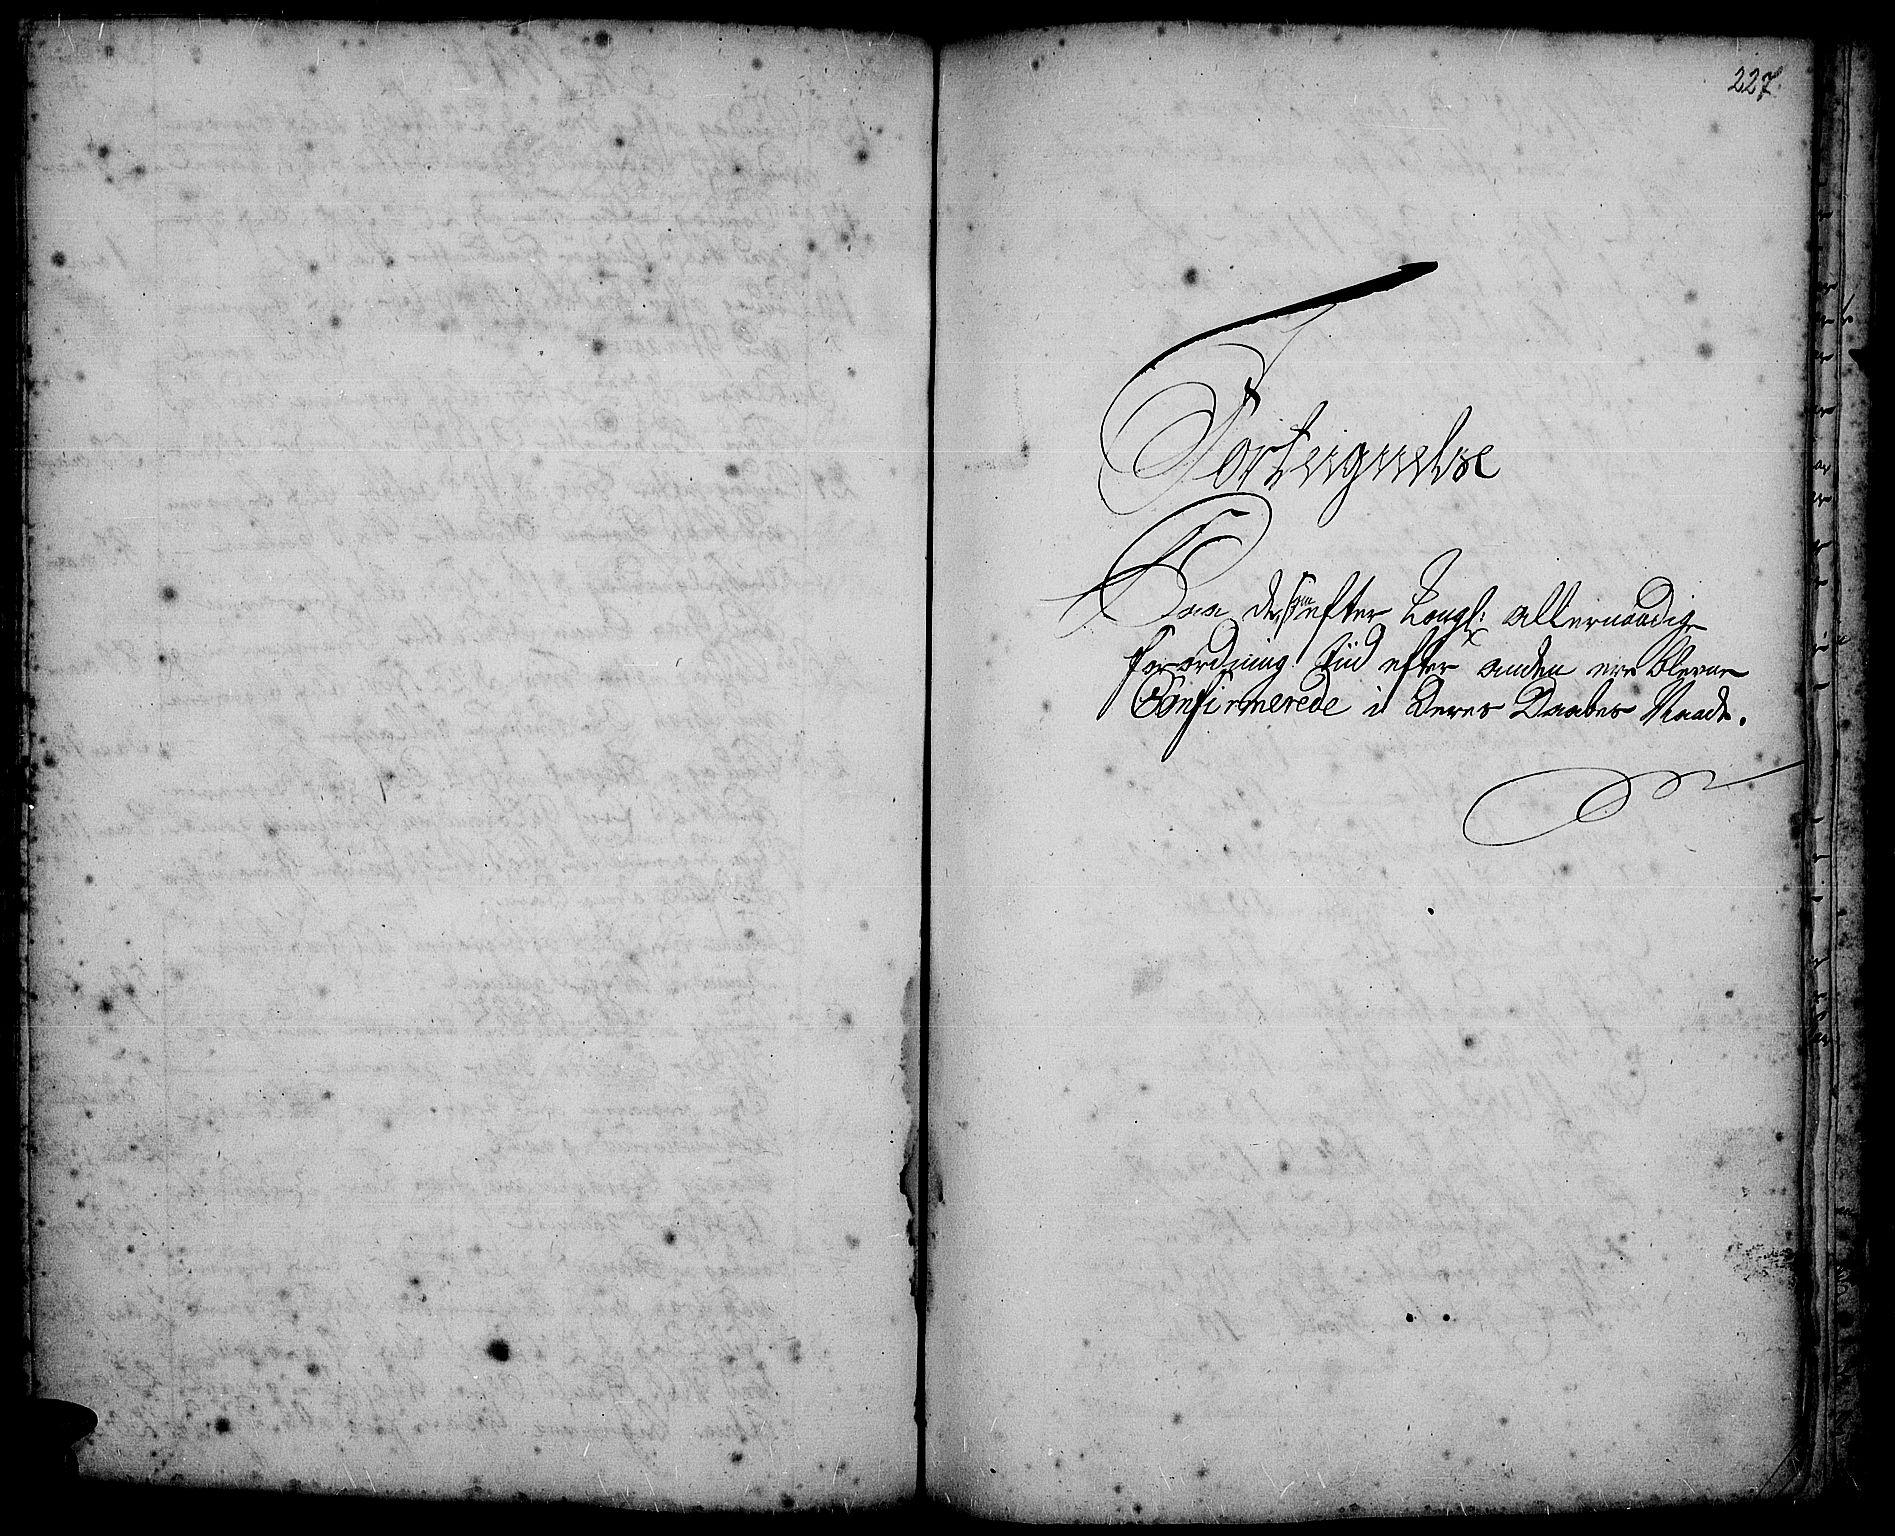 SAH, Gran prestekontor, Parish register (official) no. 2, 1732-1744, p. 227